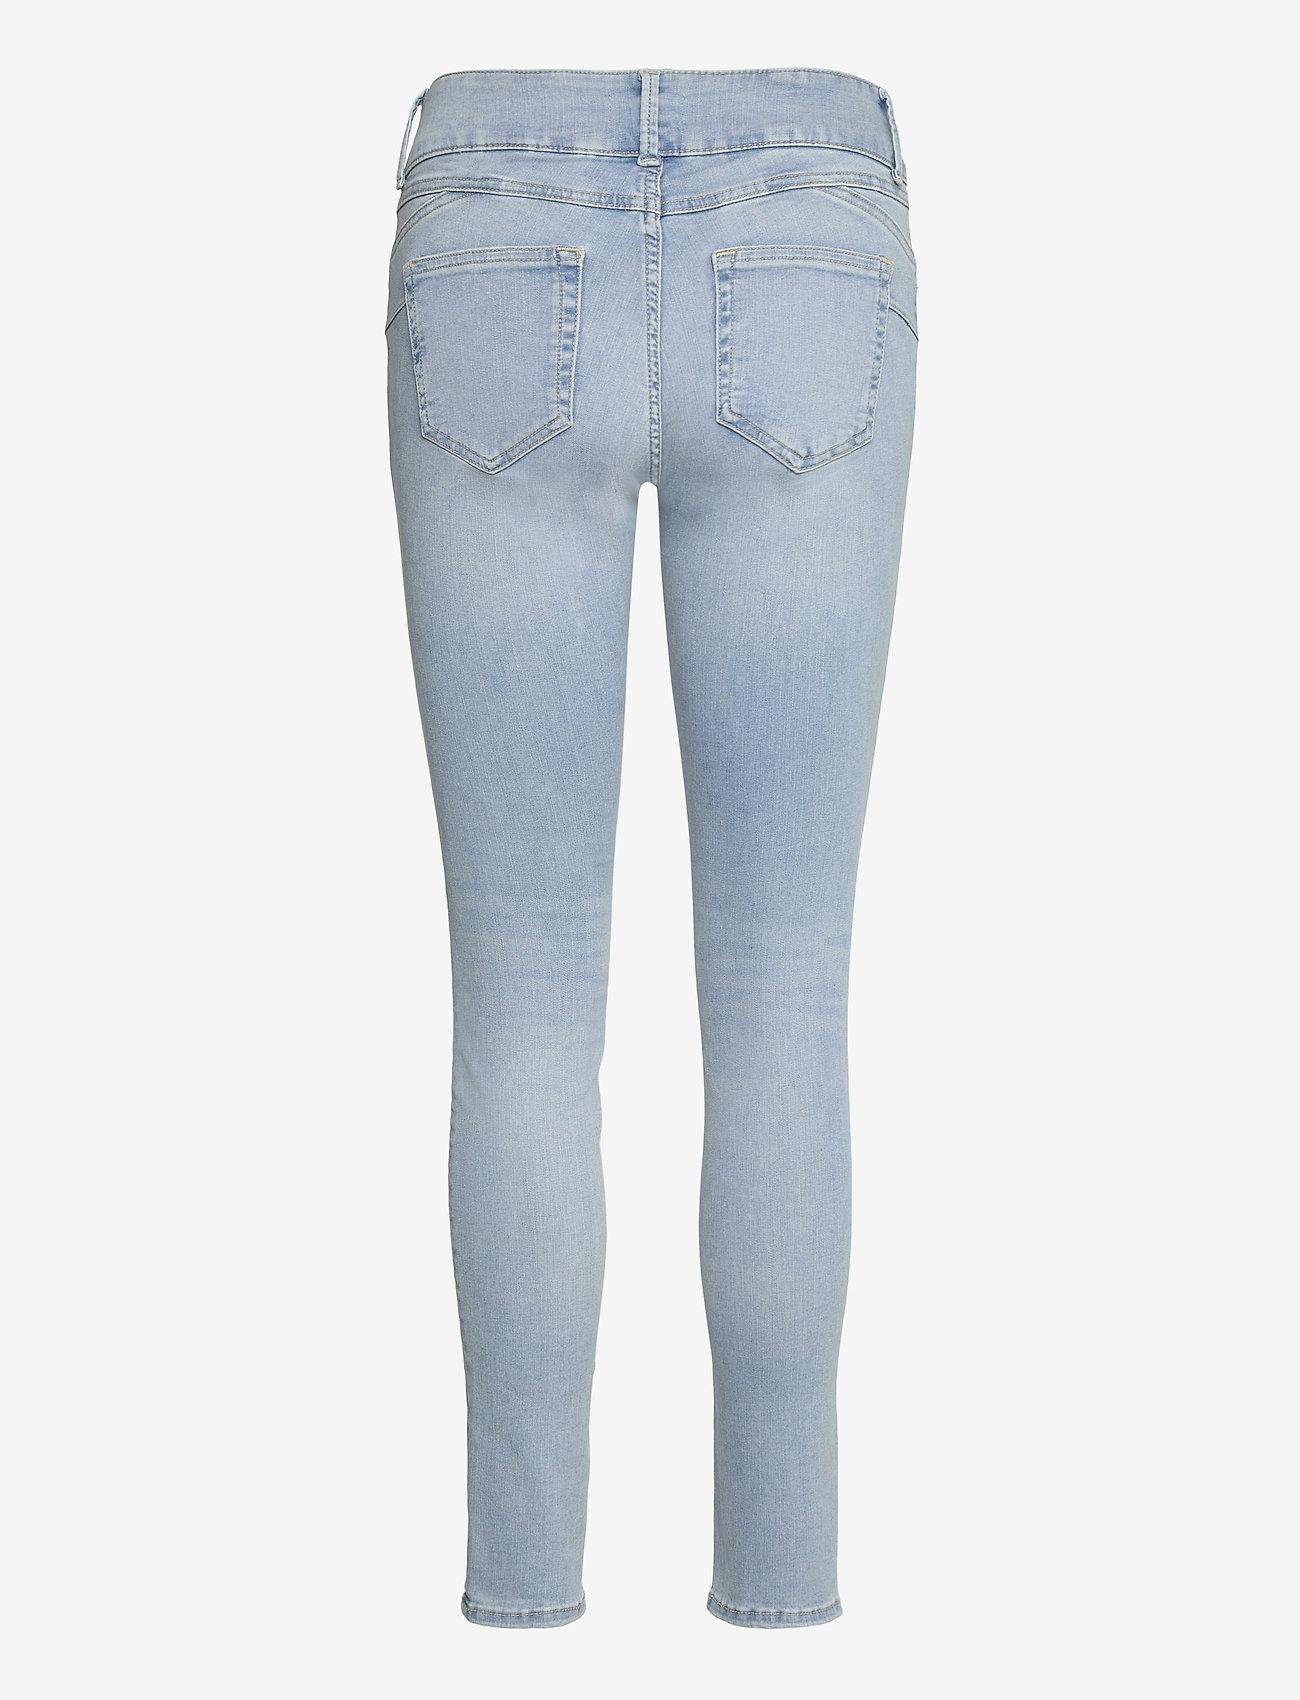 Lindex - Trousers denim Lilly lt blue - skinny jeans - blue - 1